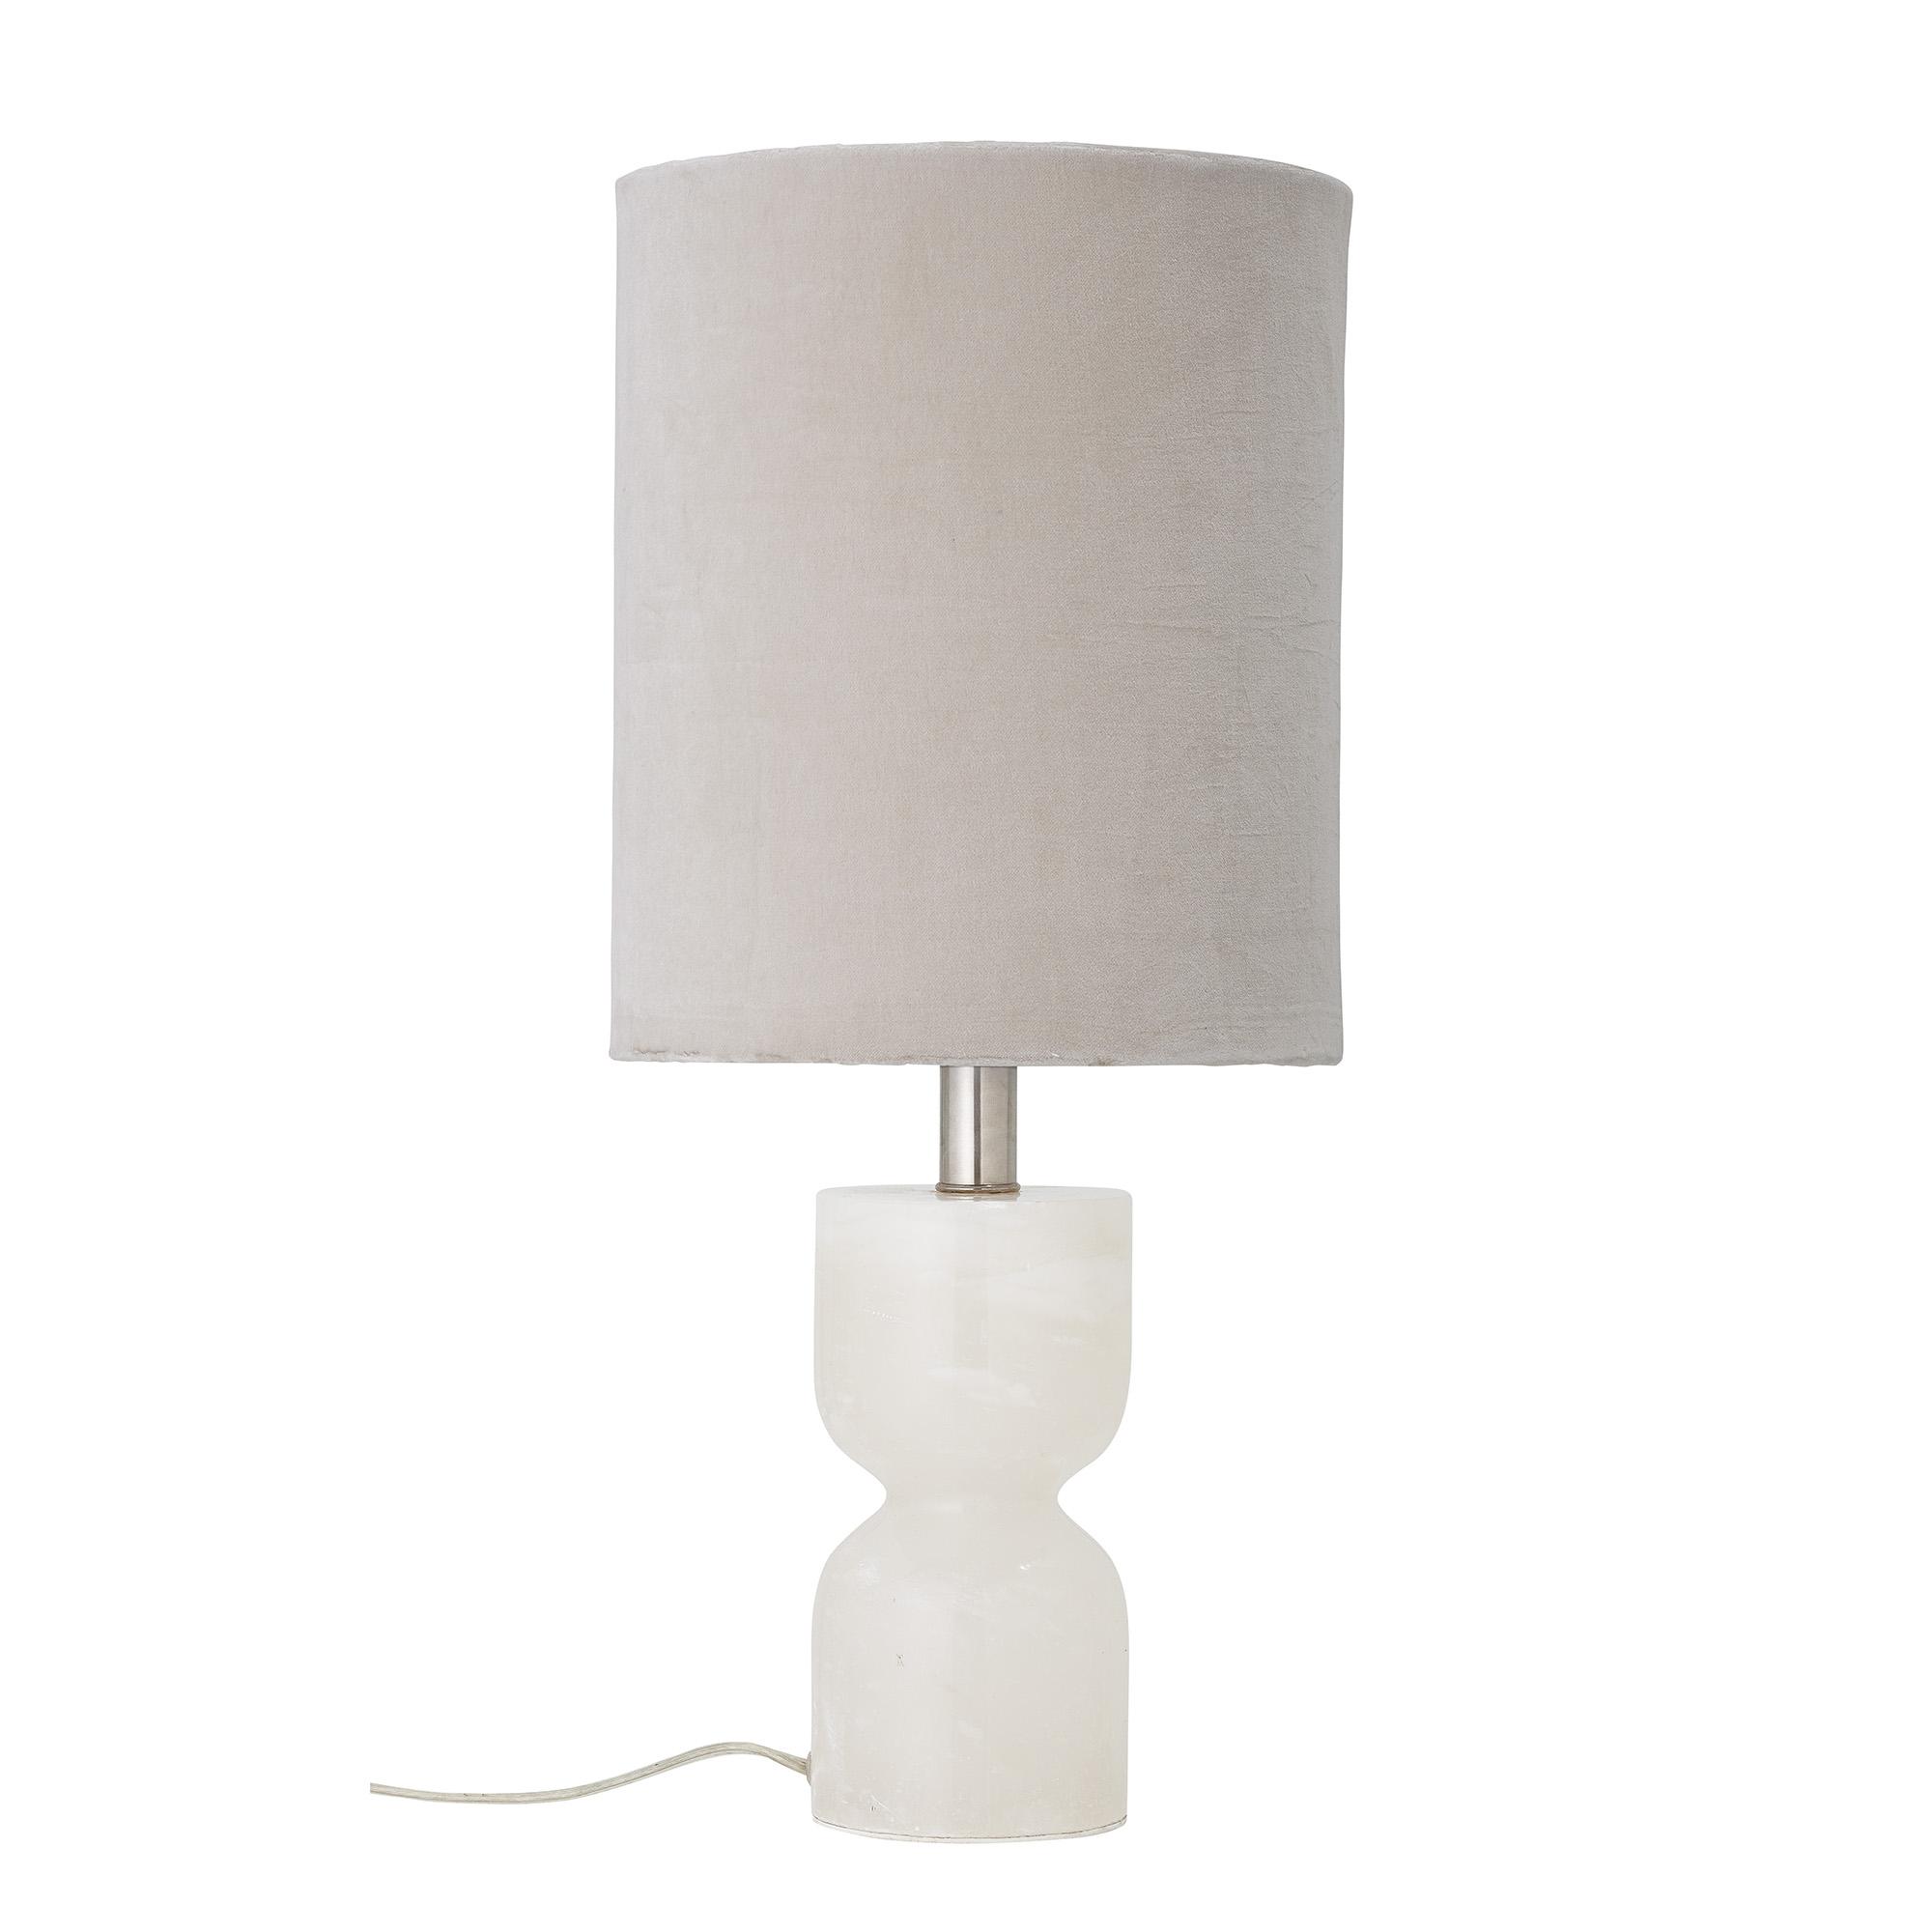 Bloomingville Indee Bordlampe